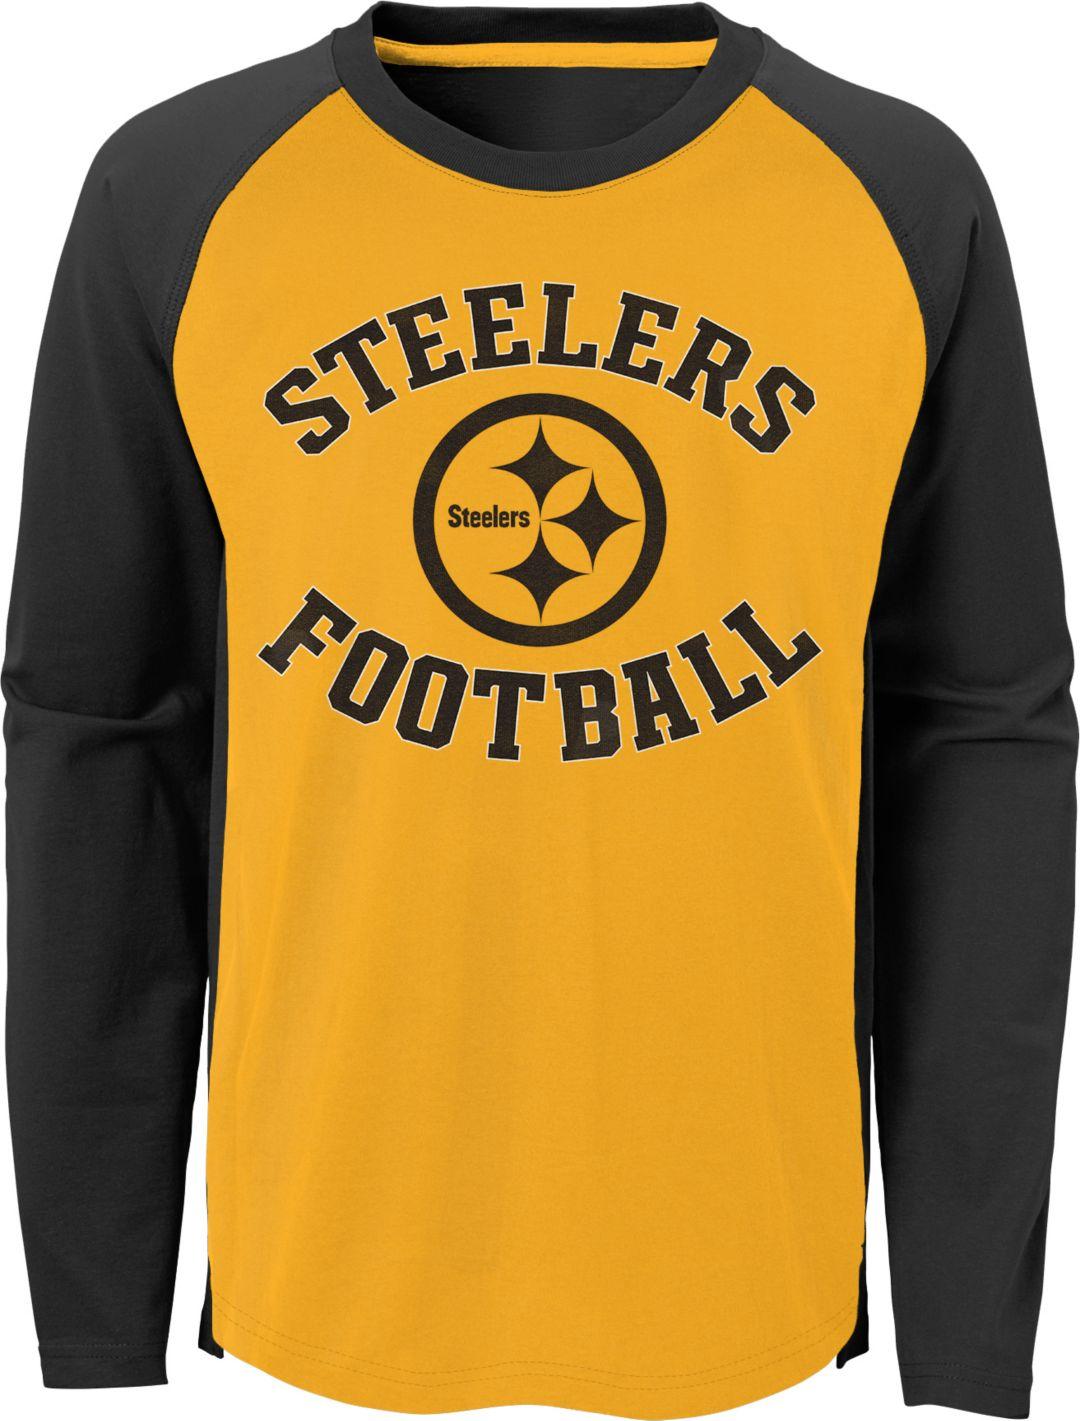 new style 43795 9cc3b NFL Team Apparel Youth Pittsburgh Steelers Air Raid Long Sleeve Black Shirt